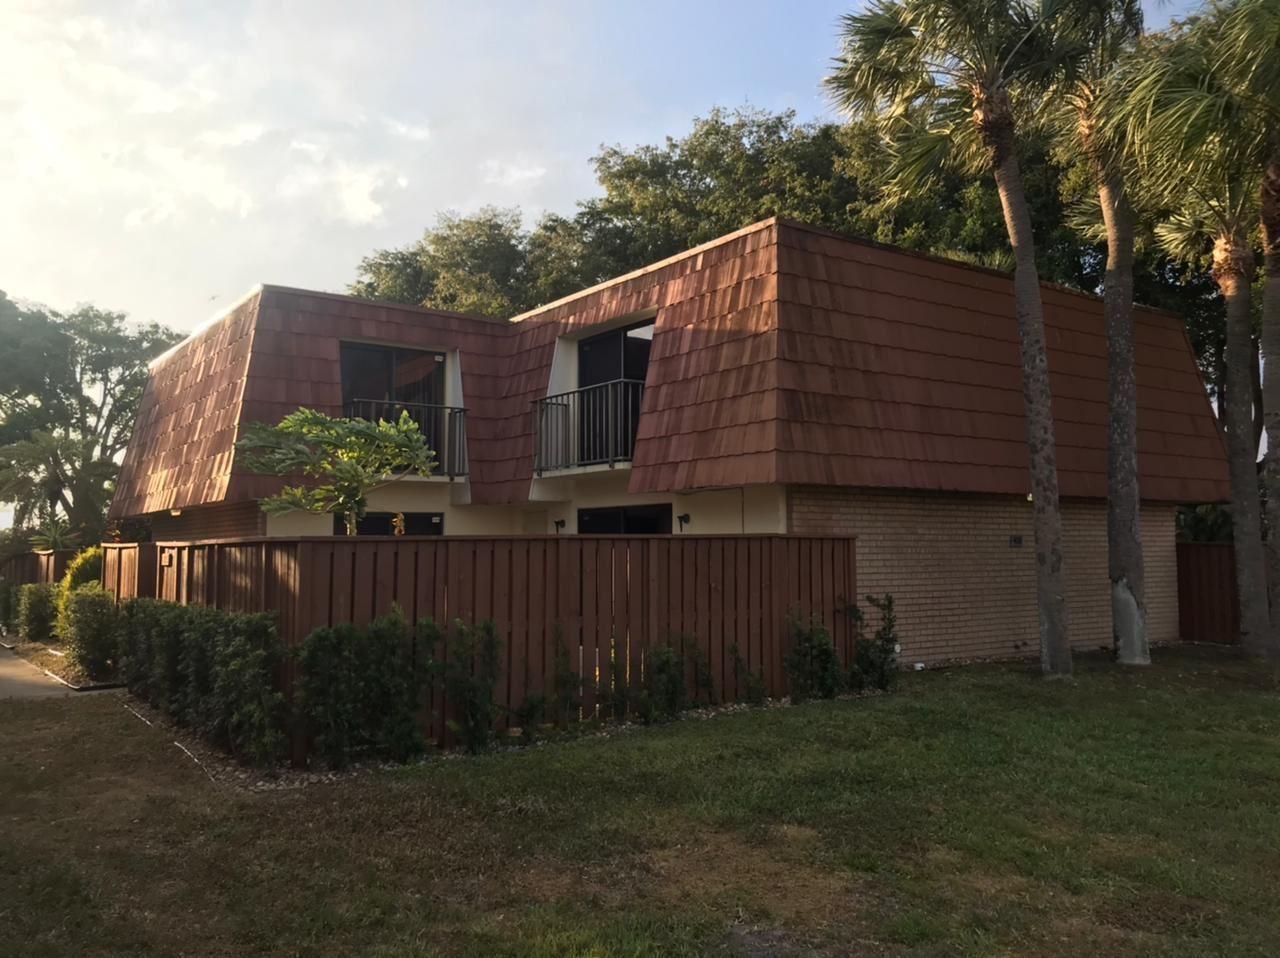 735 Buttonwood Lane, Boynton Beach, FL 33435 - #: RX-10693563